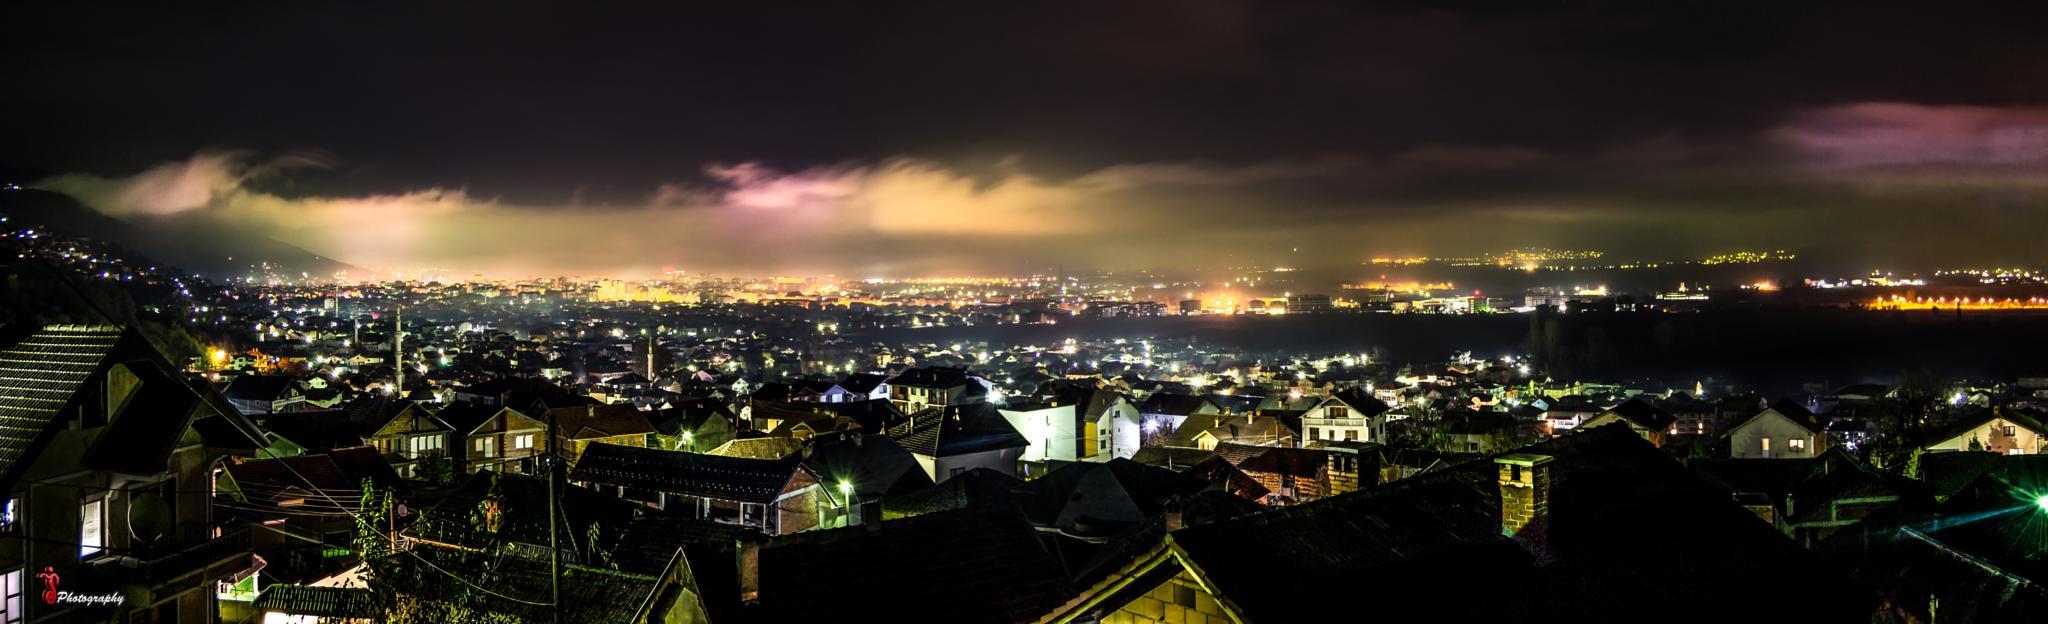 Cityscape at night - Tetovo by Jetmir Sejdia